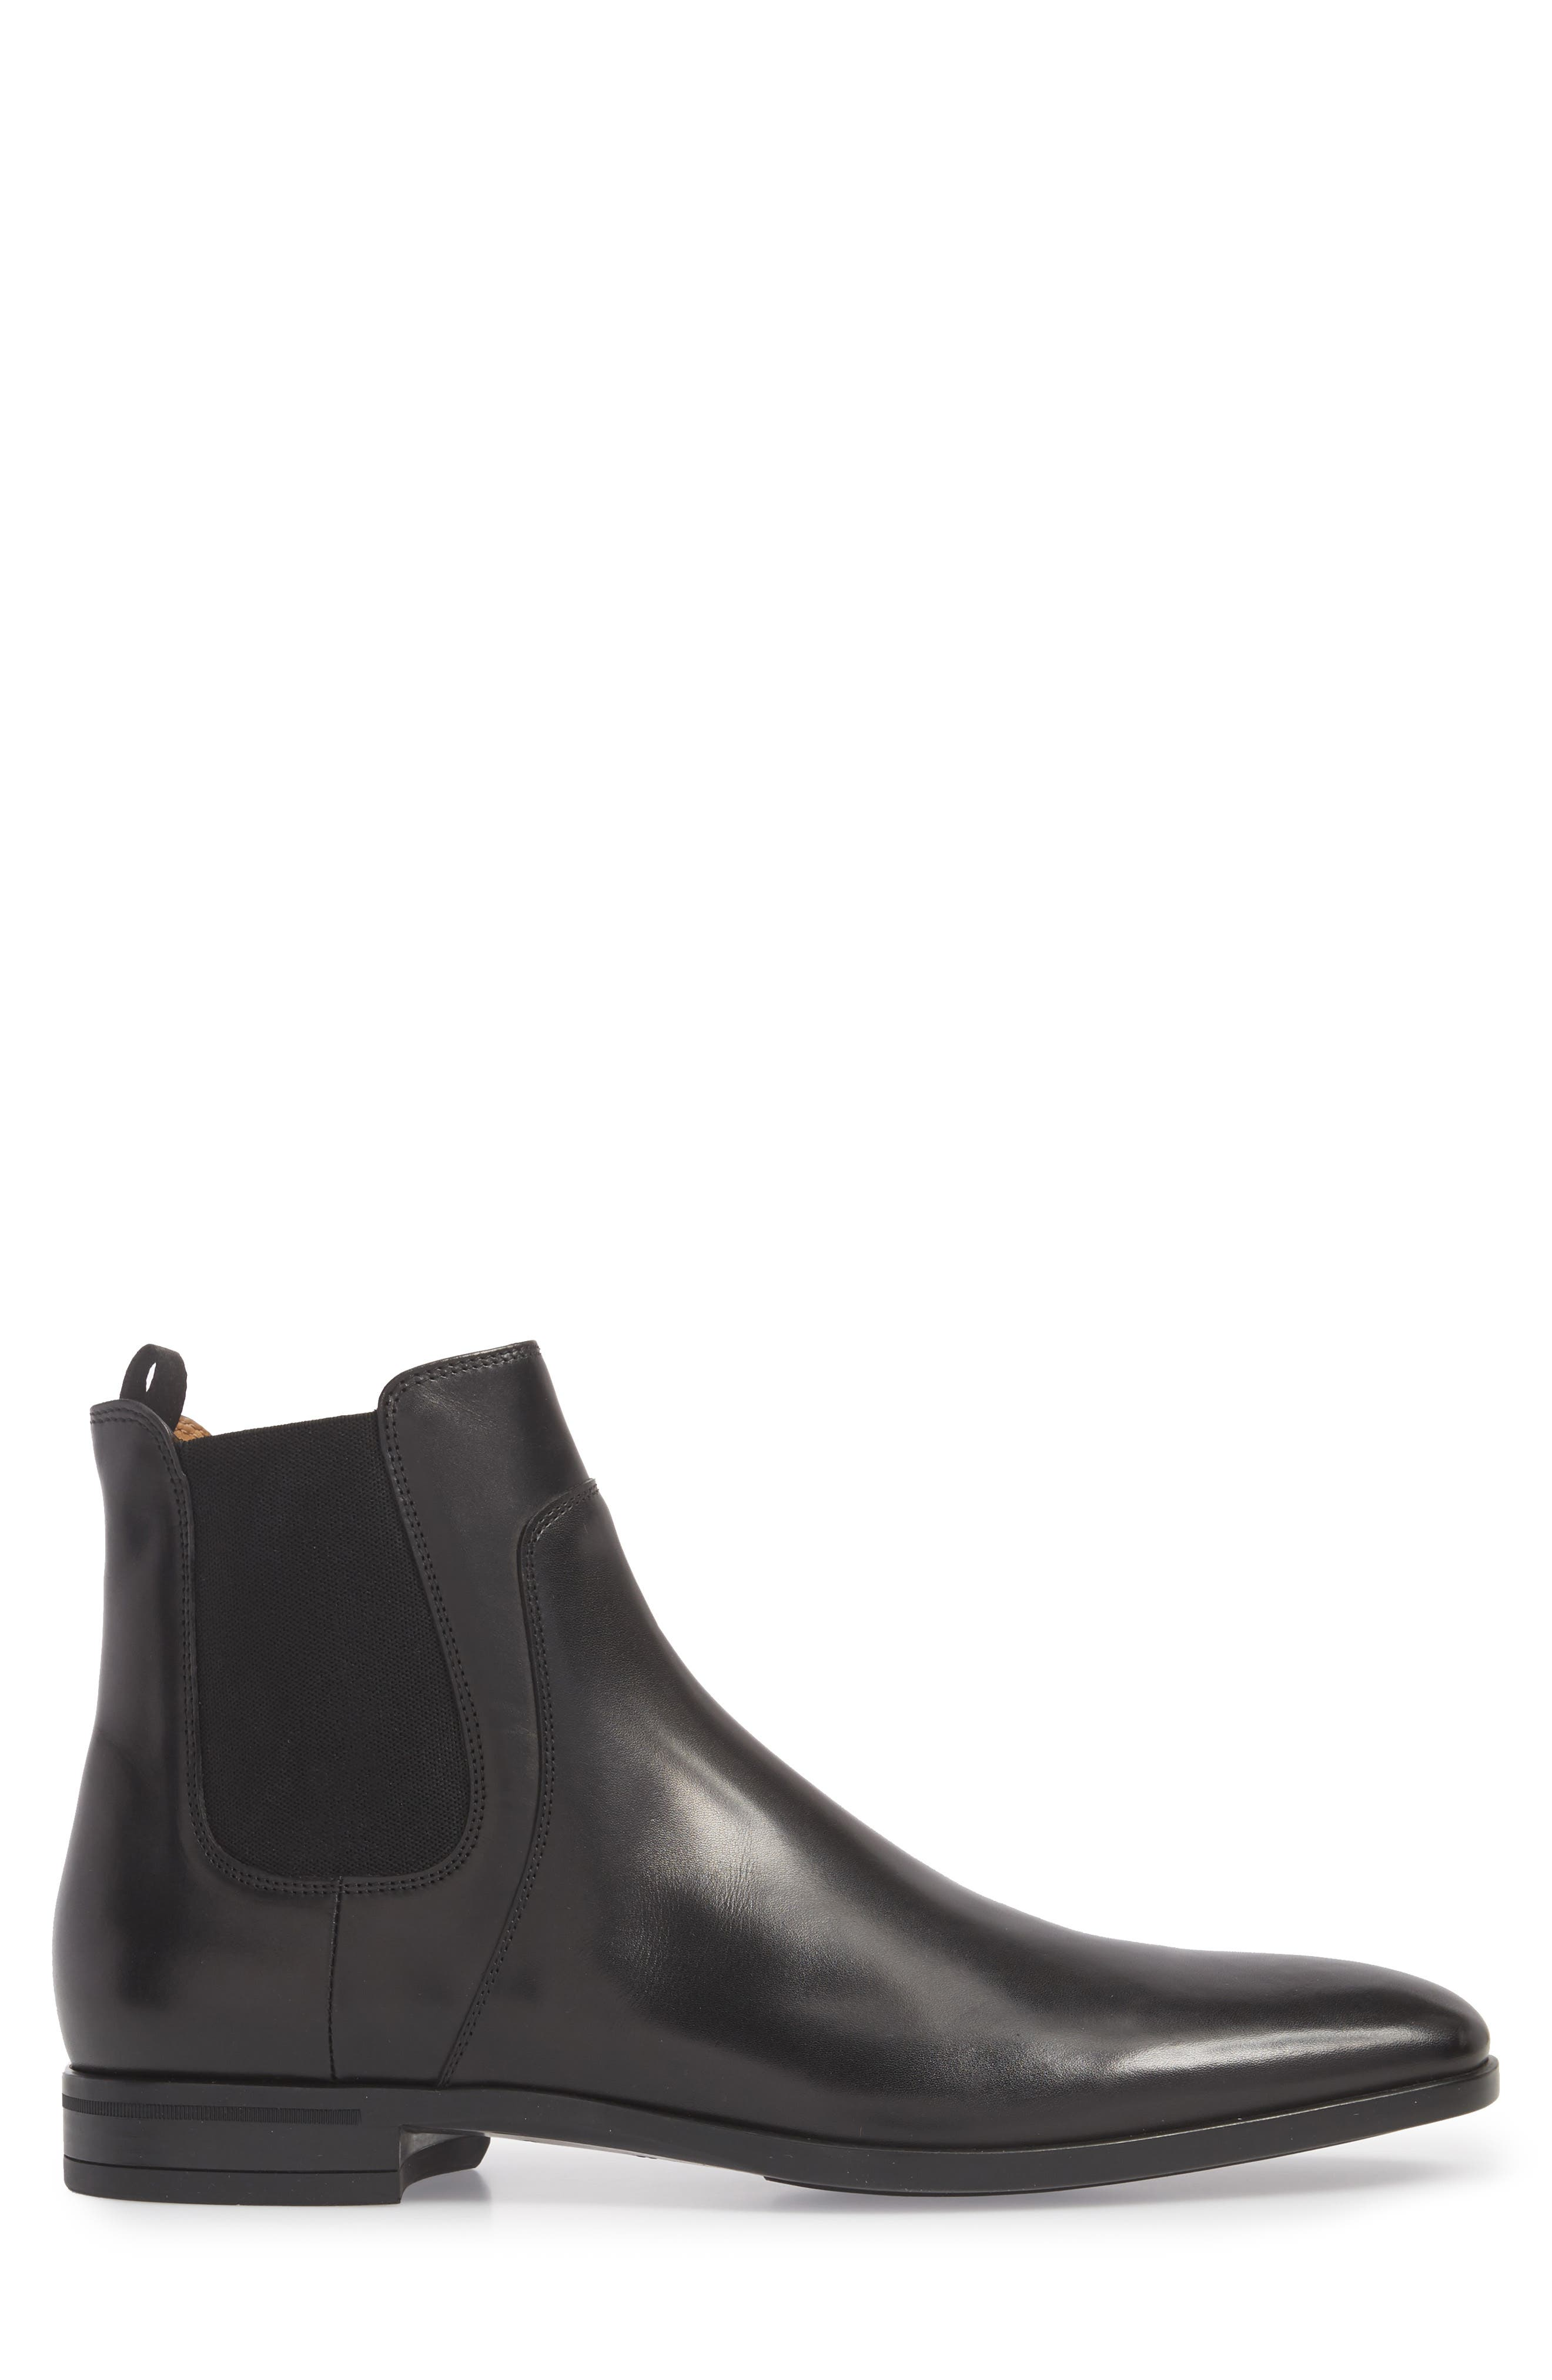 Hugo Boss Portland Mid Chelsea Boot,                             Alternate thumbnail 3, color,                             BLACK LEATHER